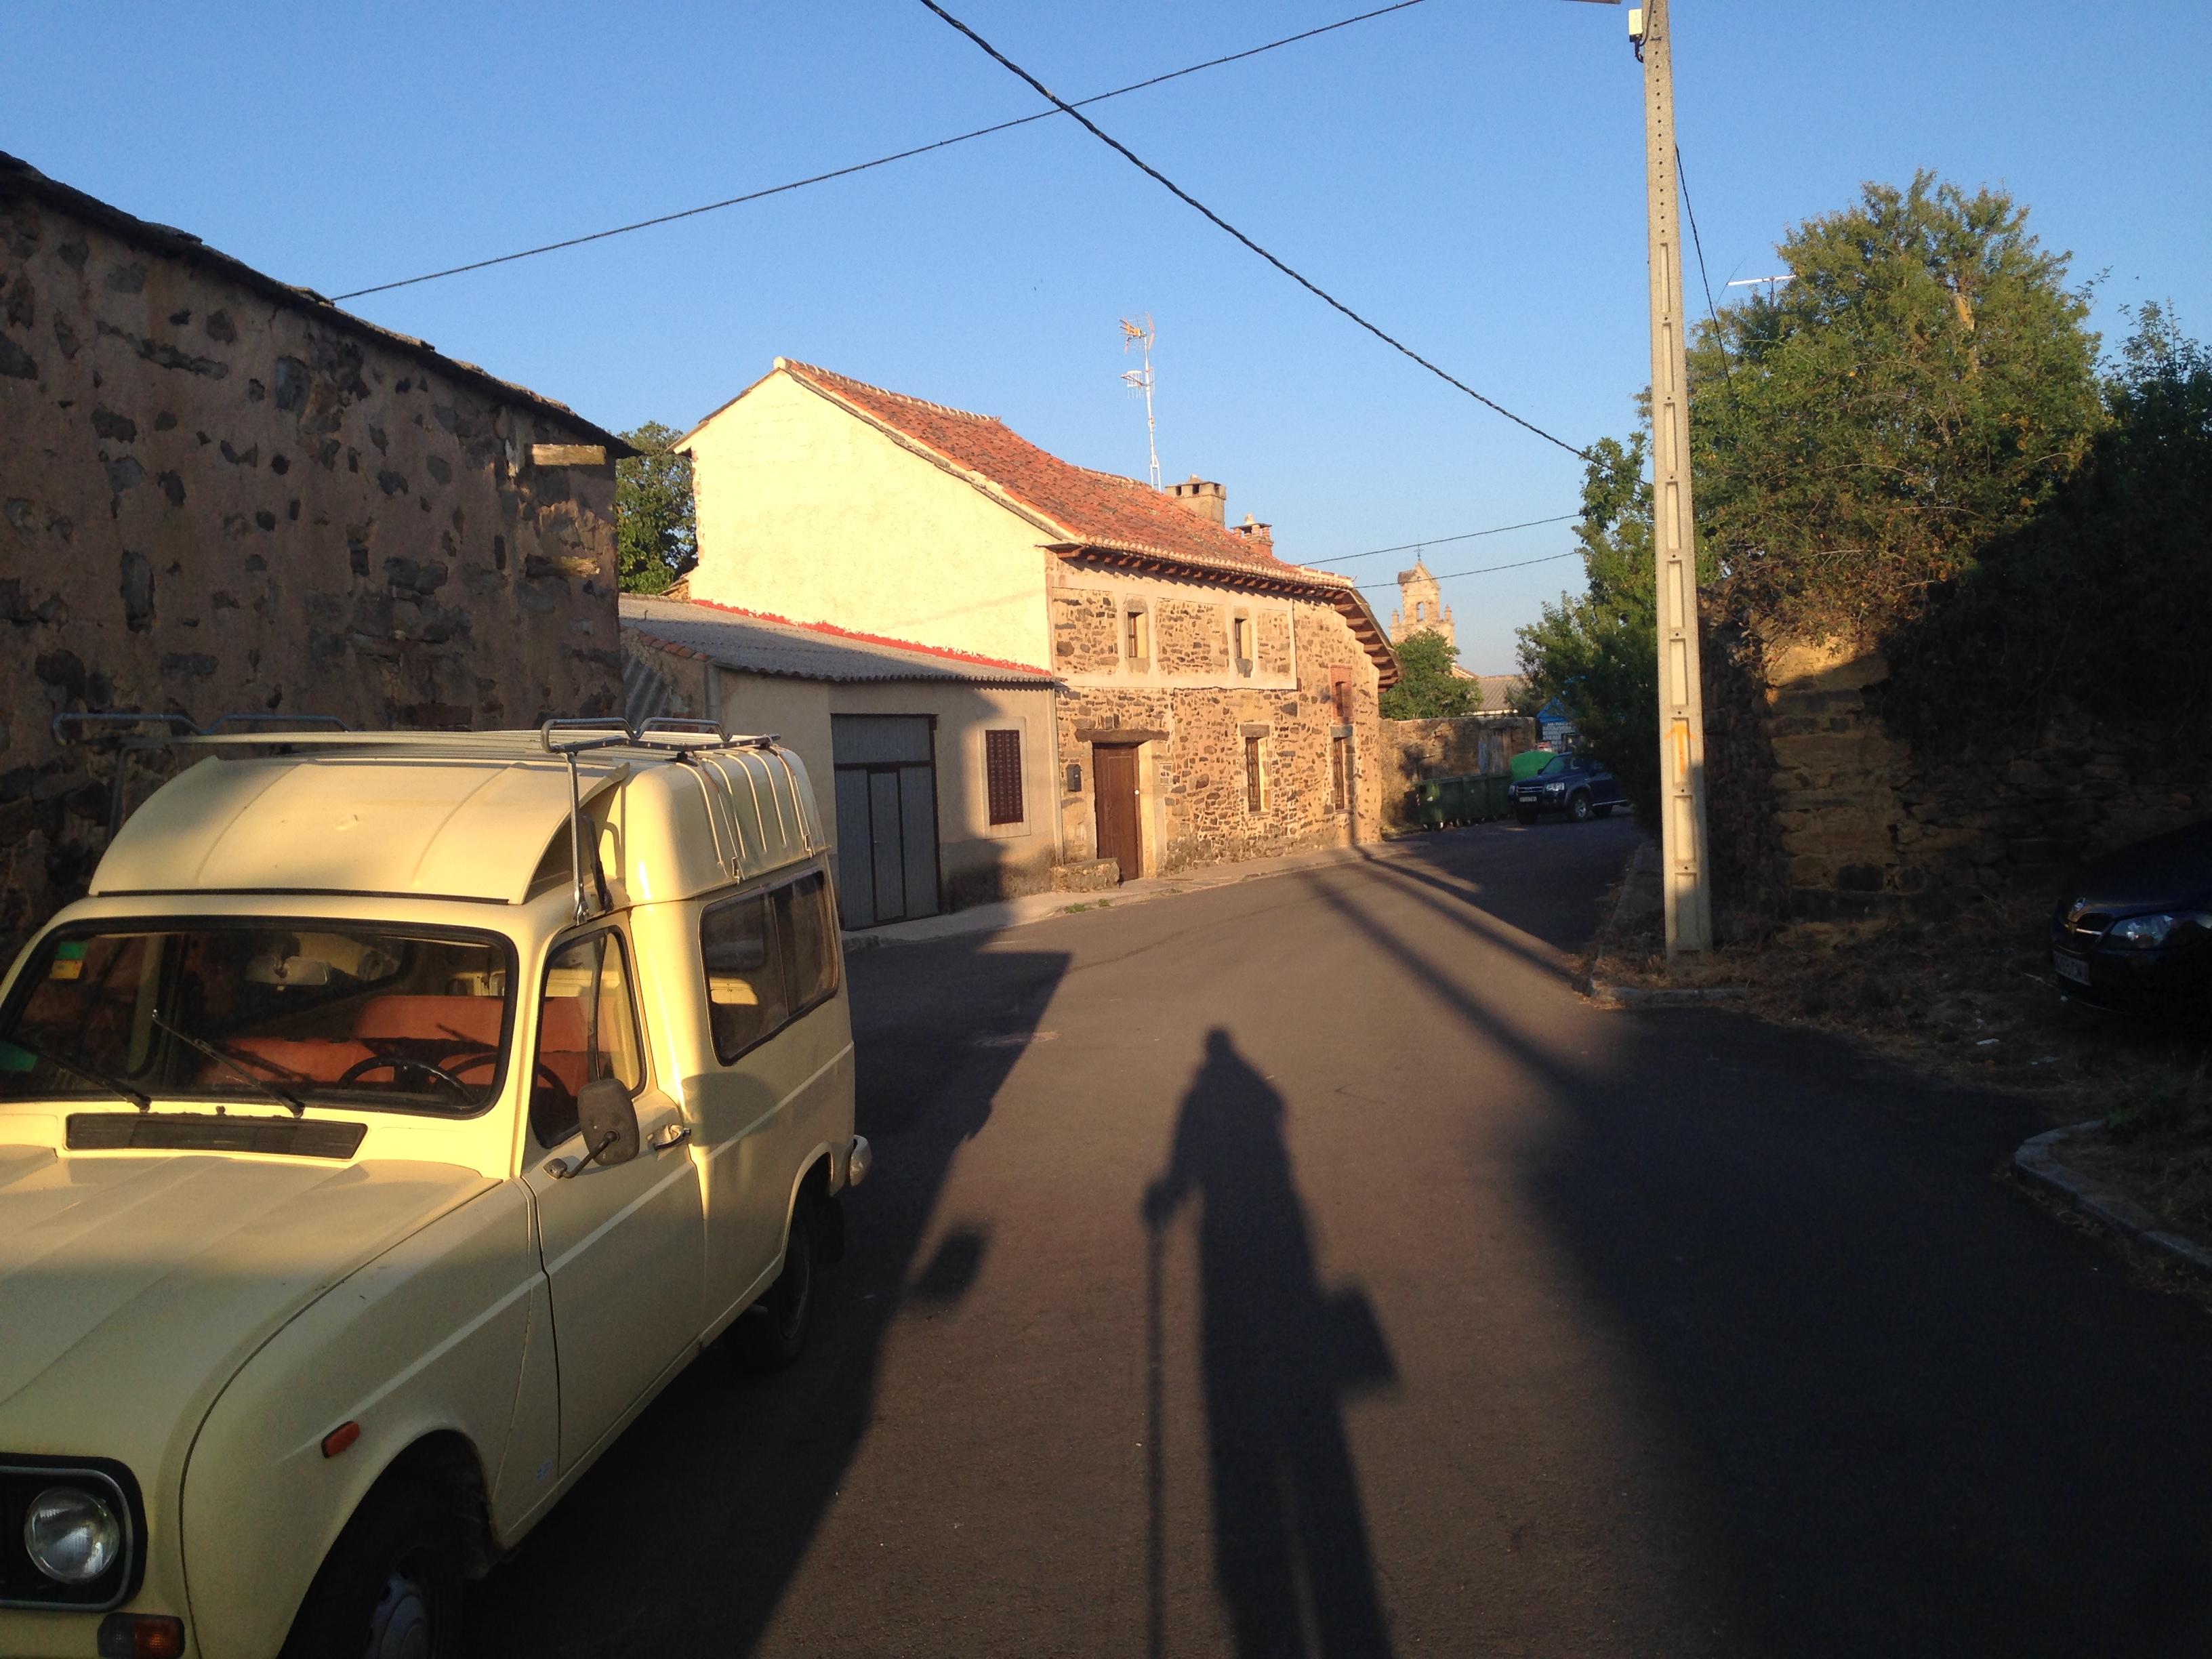 camino de santiago iphone 2014 899 IMG_5337.jpg